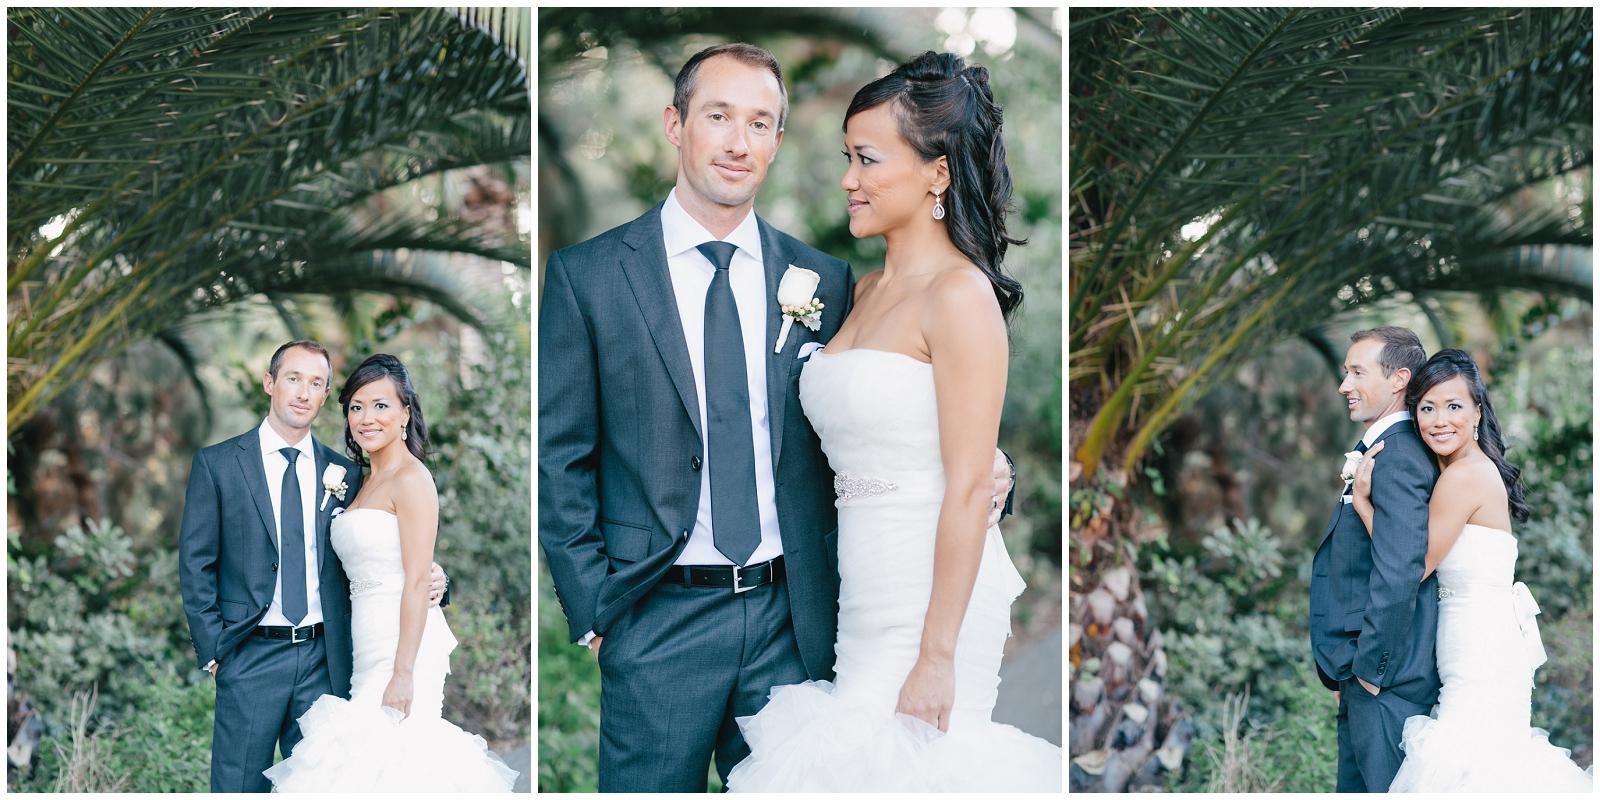 San-Francisco-Bay-Area-Wedding-Photography-Destination-5.jpg